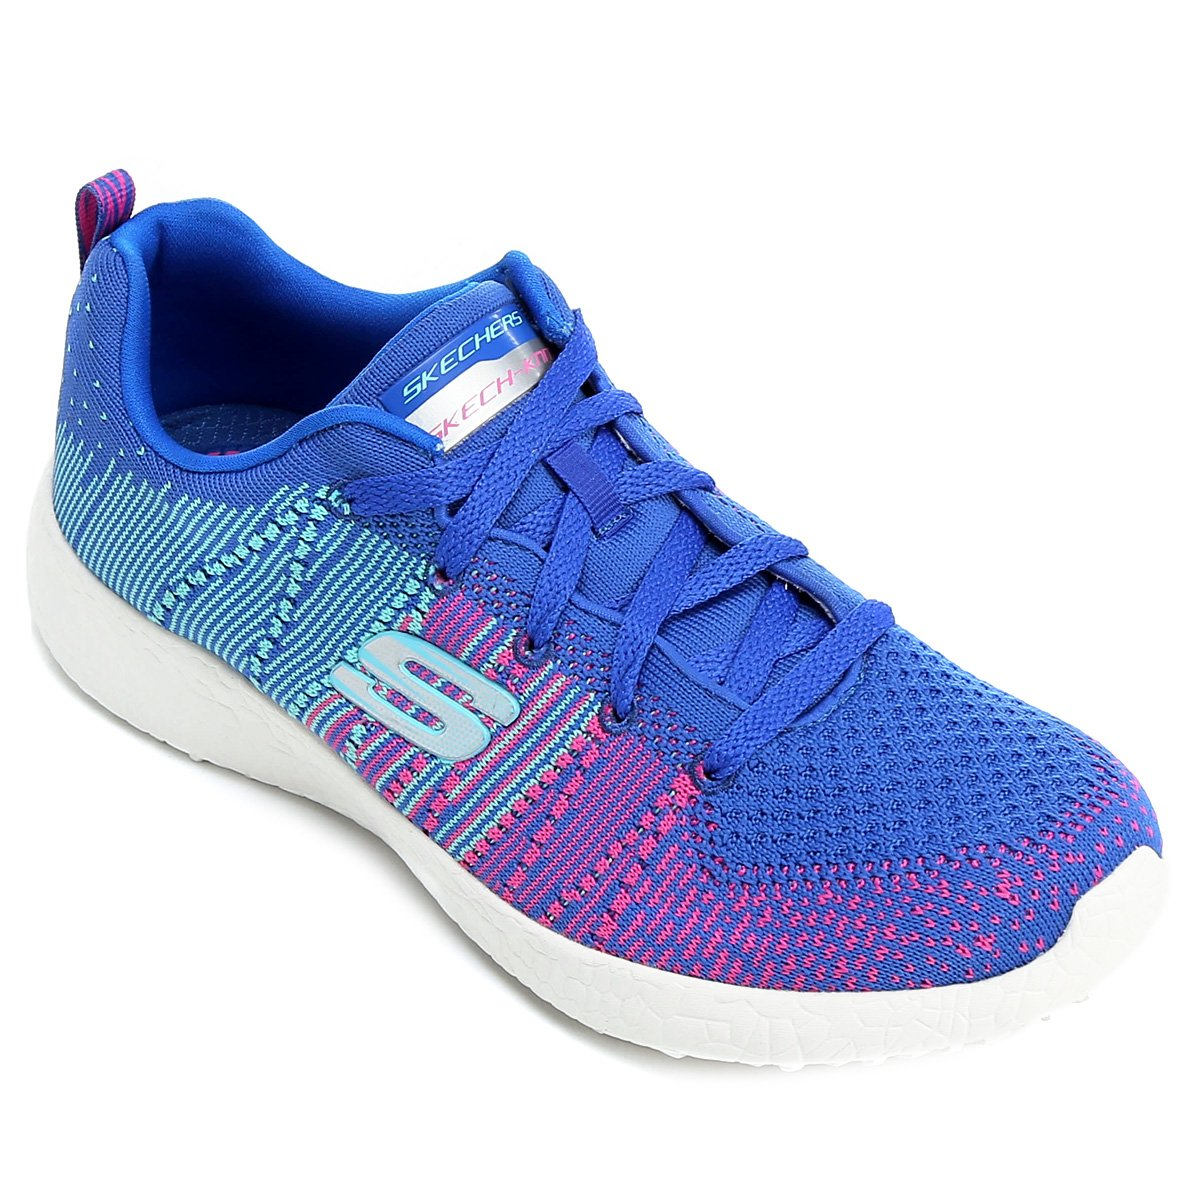 d51e7c069 Tênis Skechers Burst Ellipse Feminino - Azul Turquesa e Pink - Compre Agora